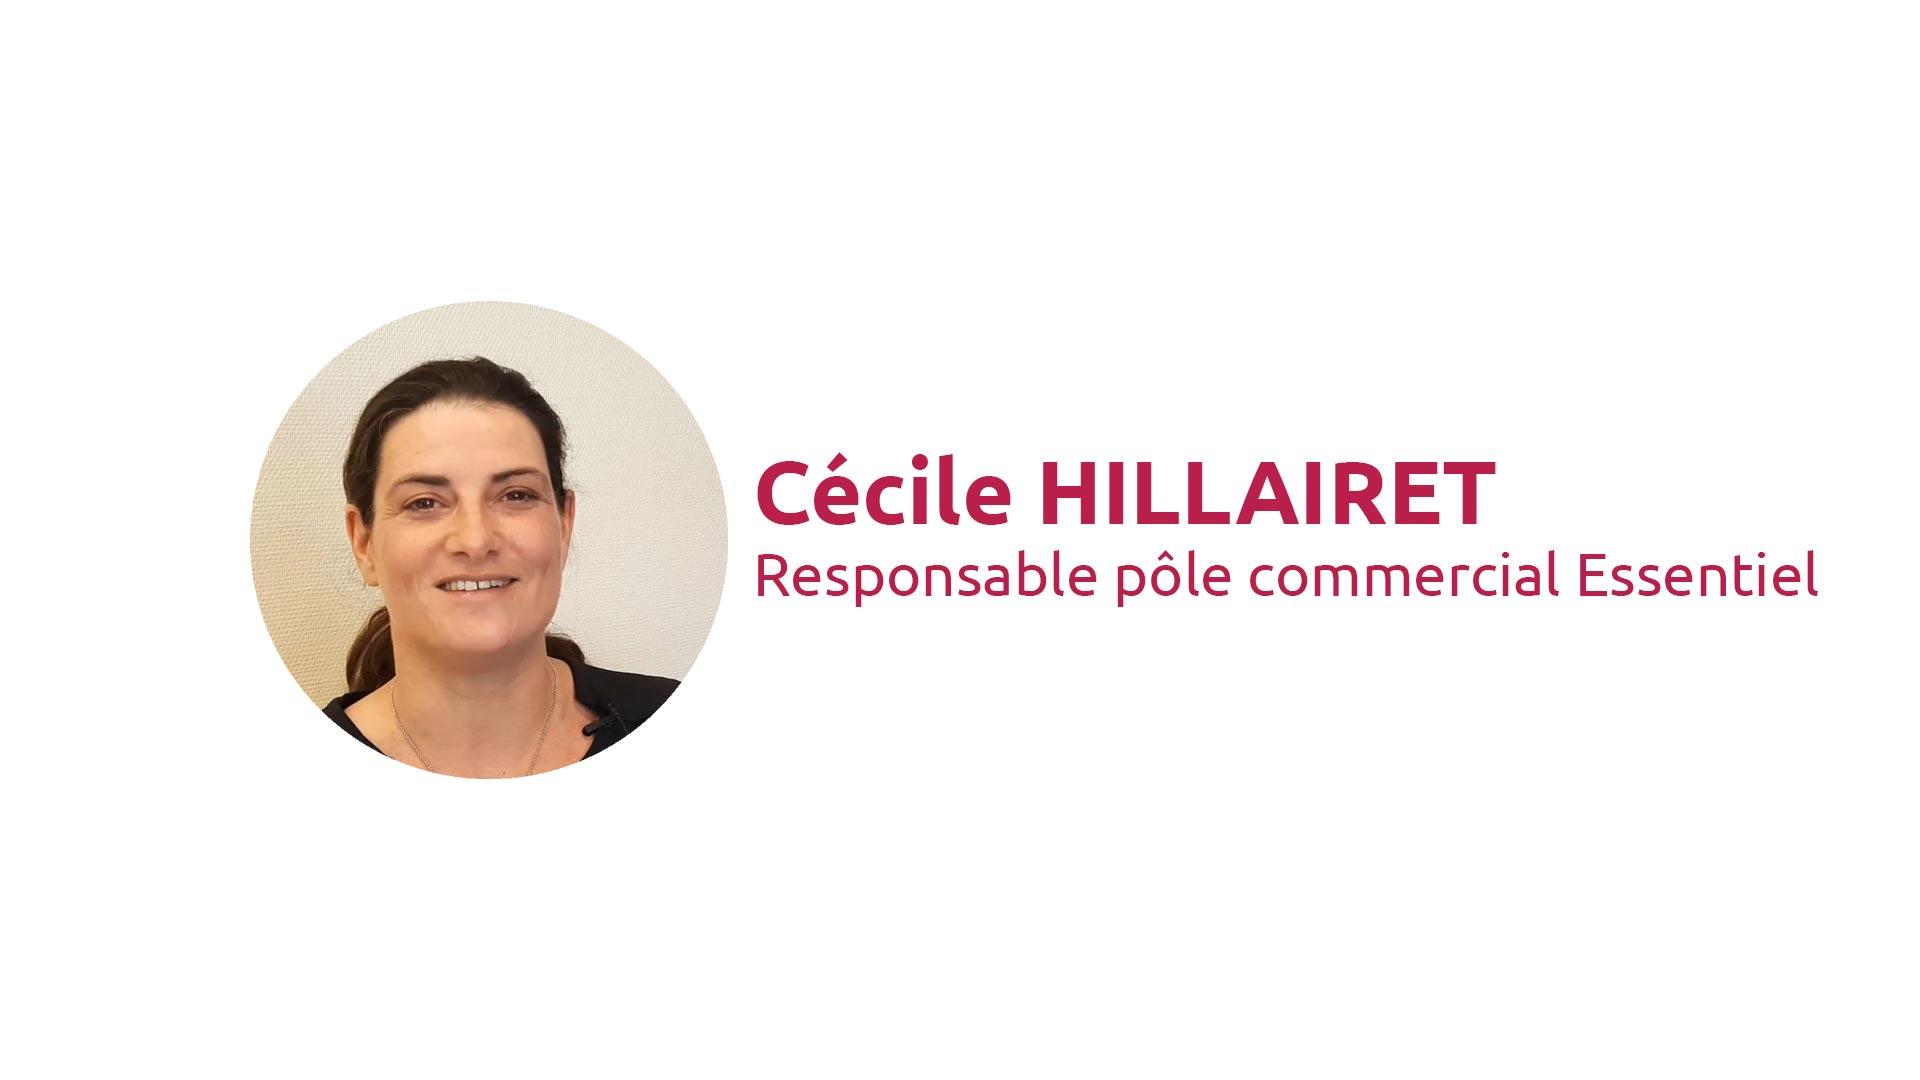 Cecile-Hillairet